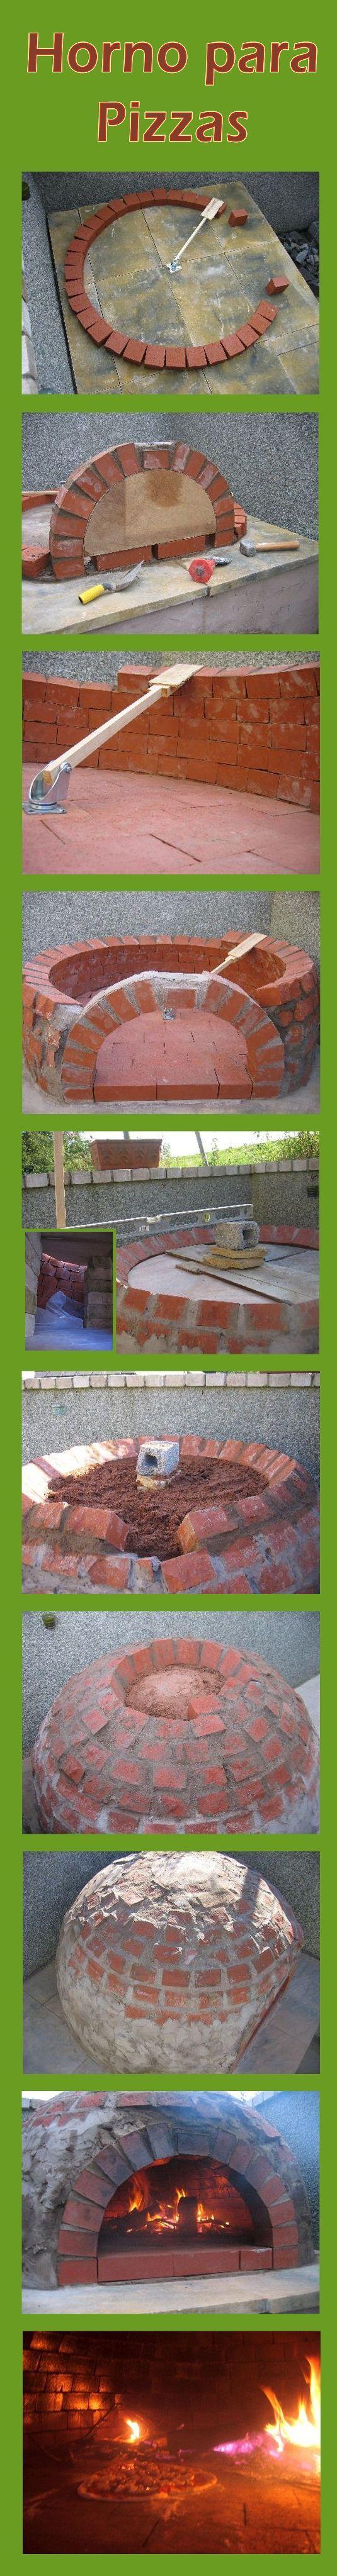 M s de 1000 ideas sobre hornos de ladrillo en pinterest for Ladrillos decorativos para exteriores